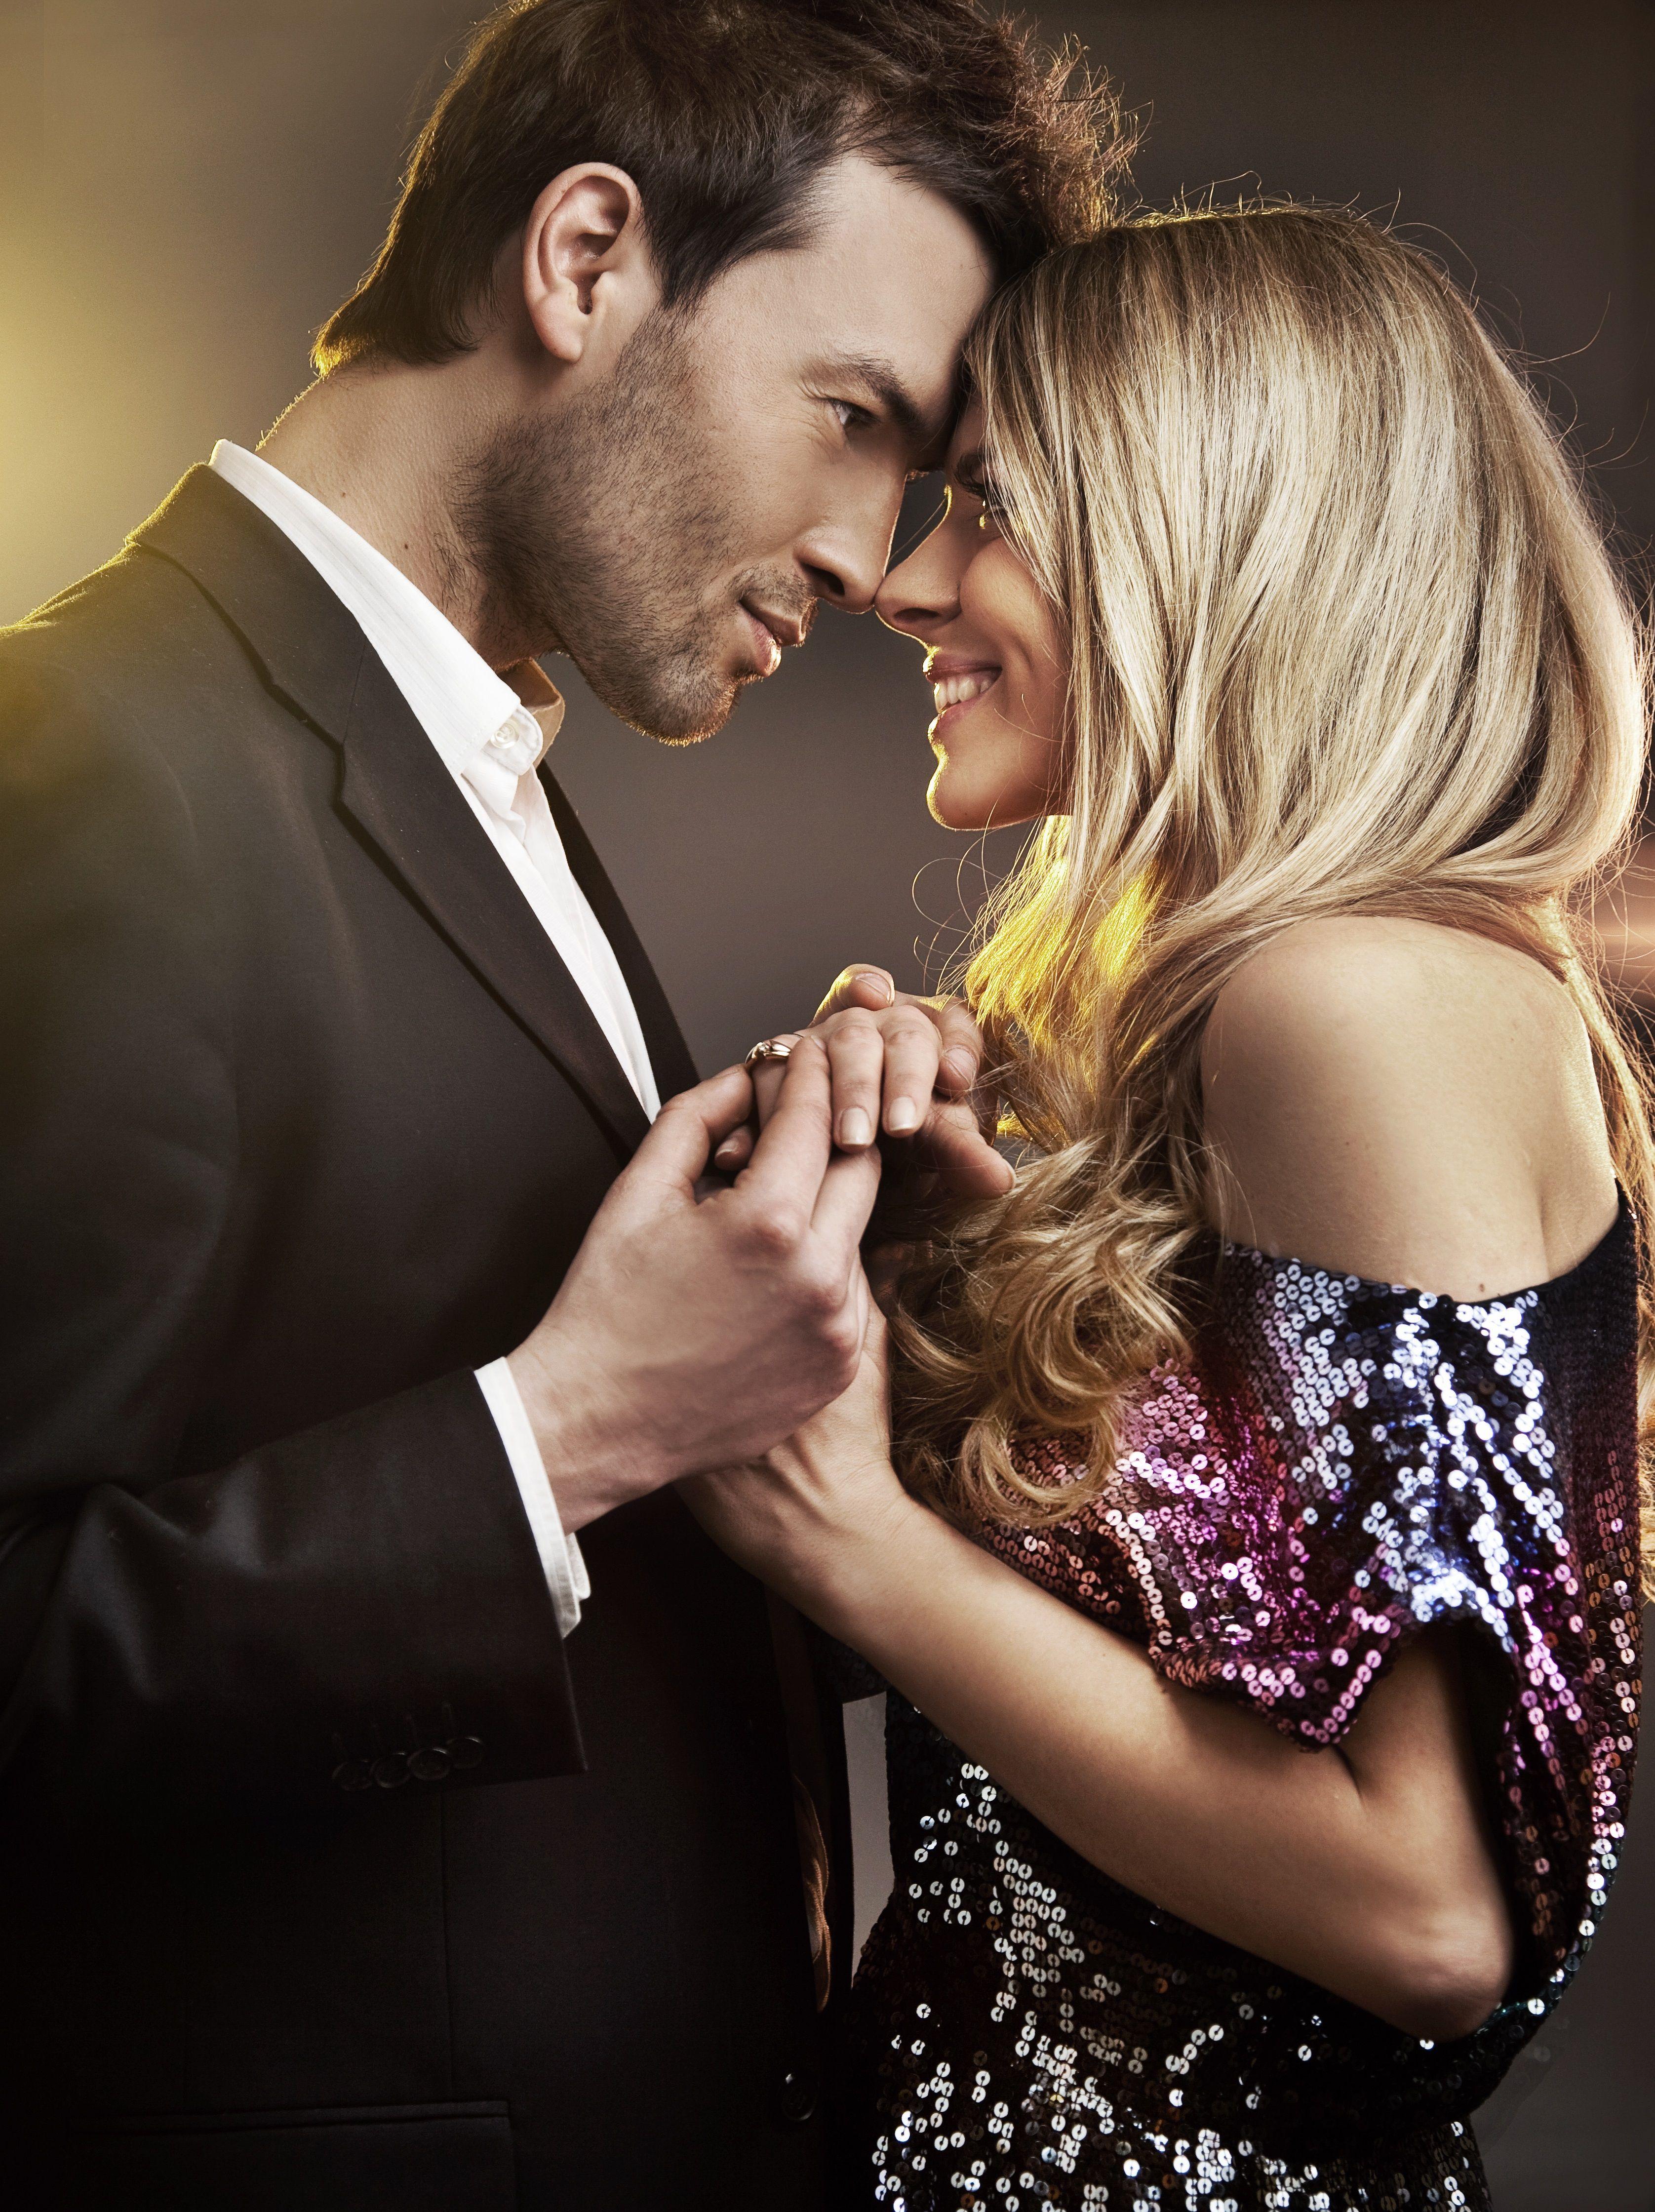 dating sites diamond